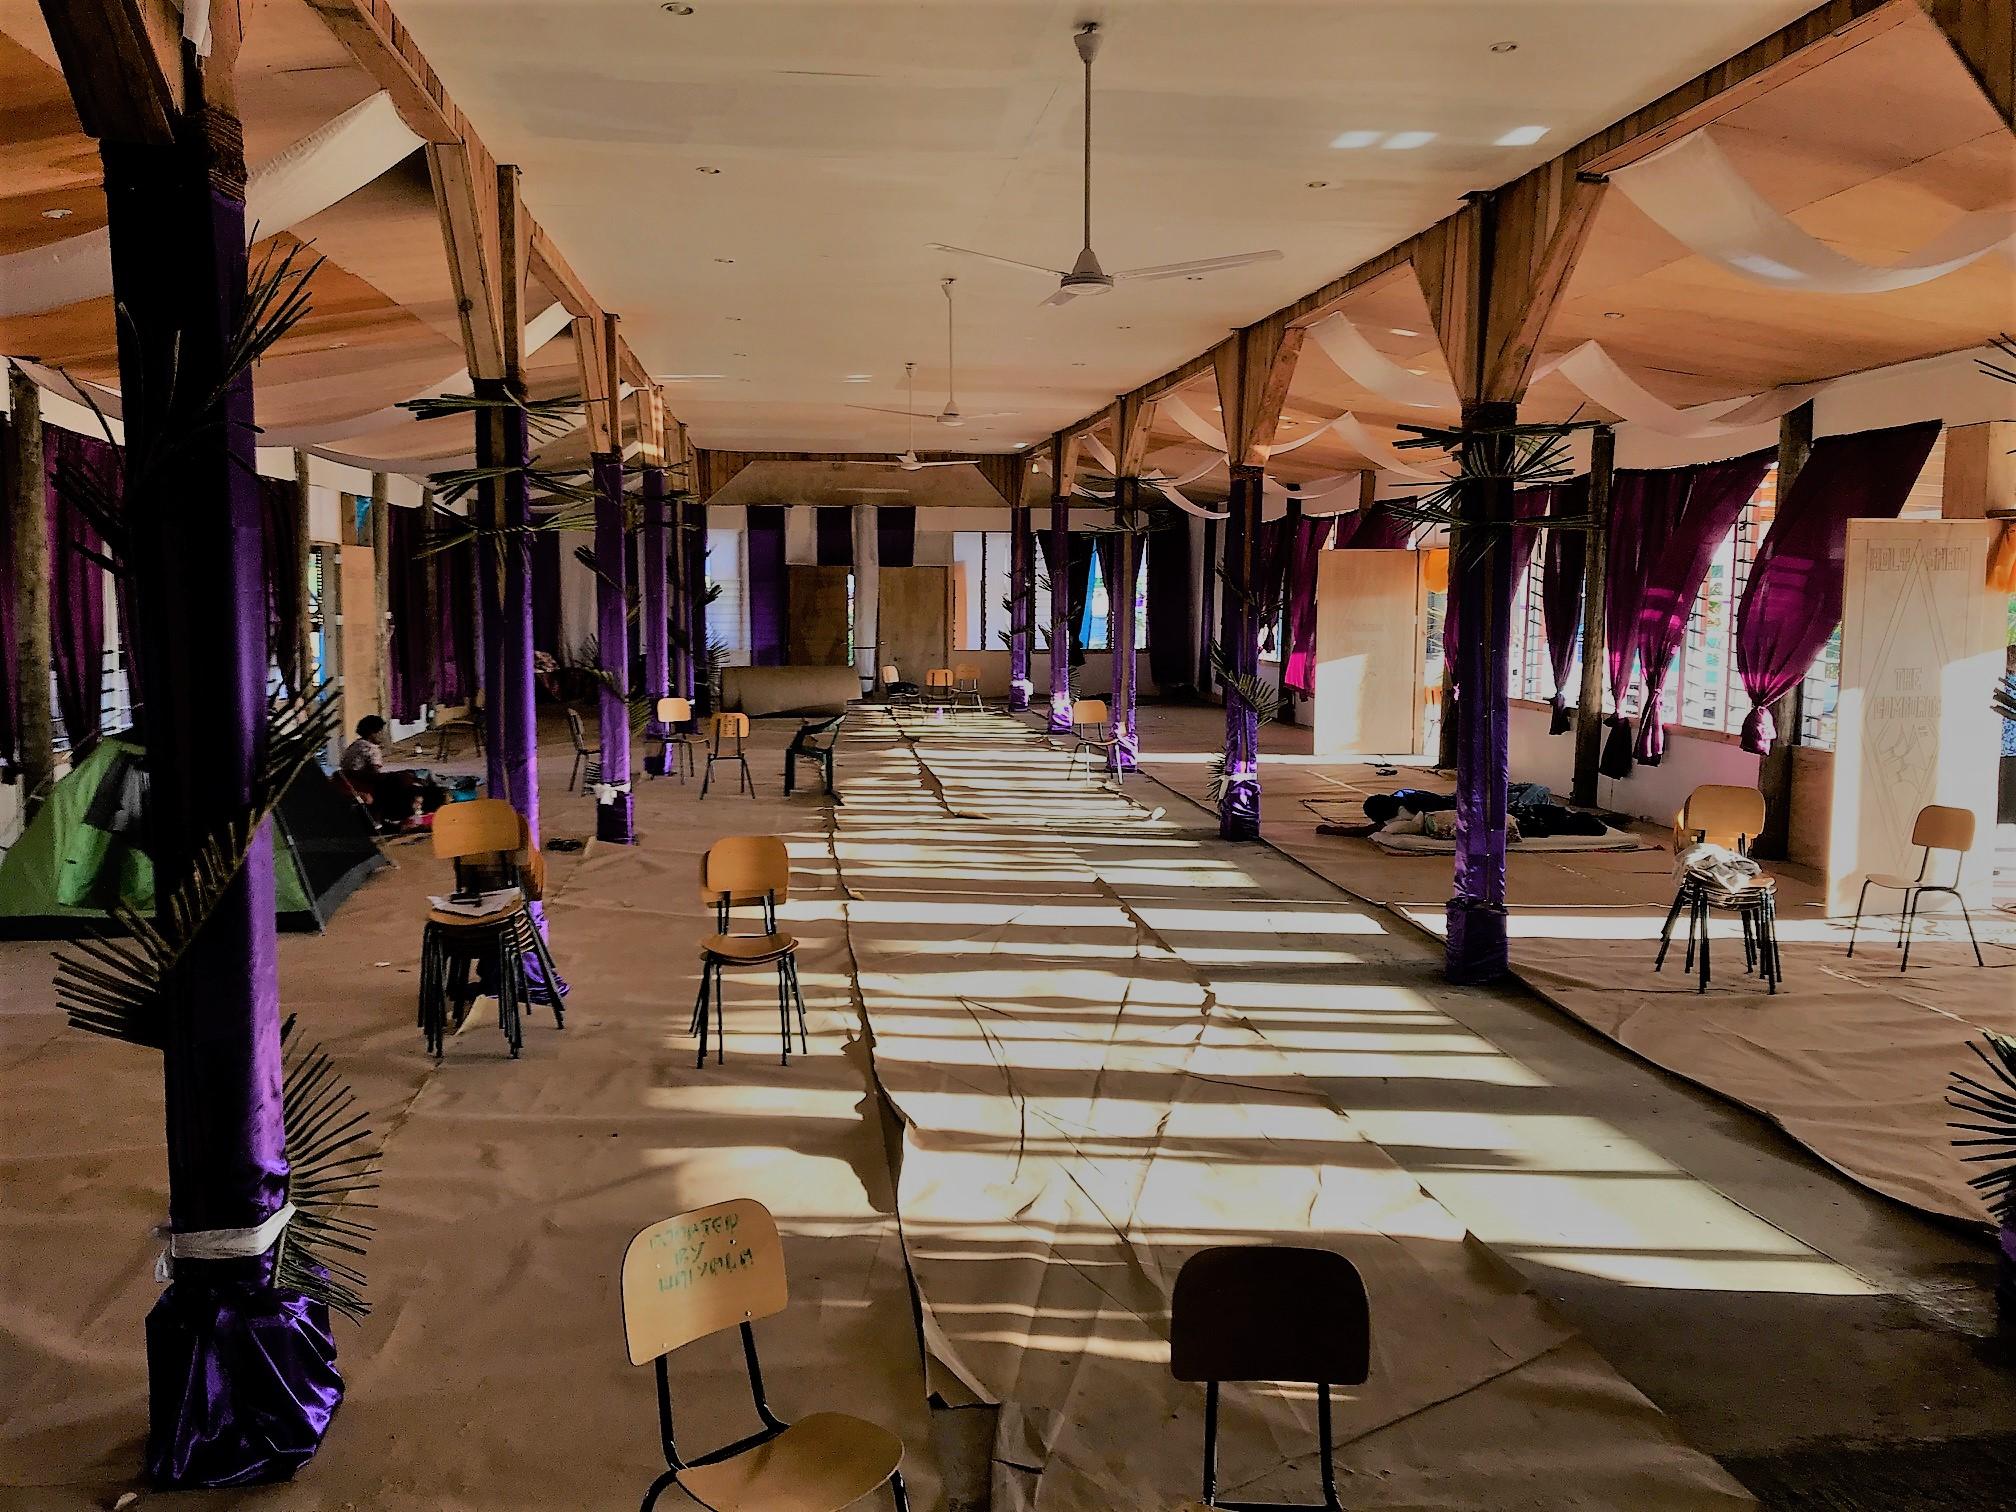 New Lautoka hall interior